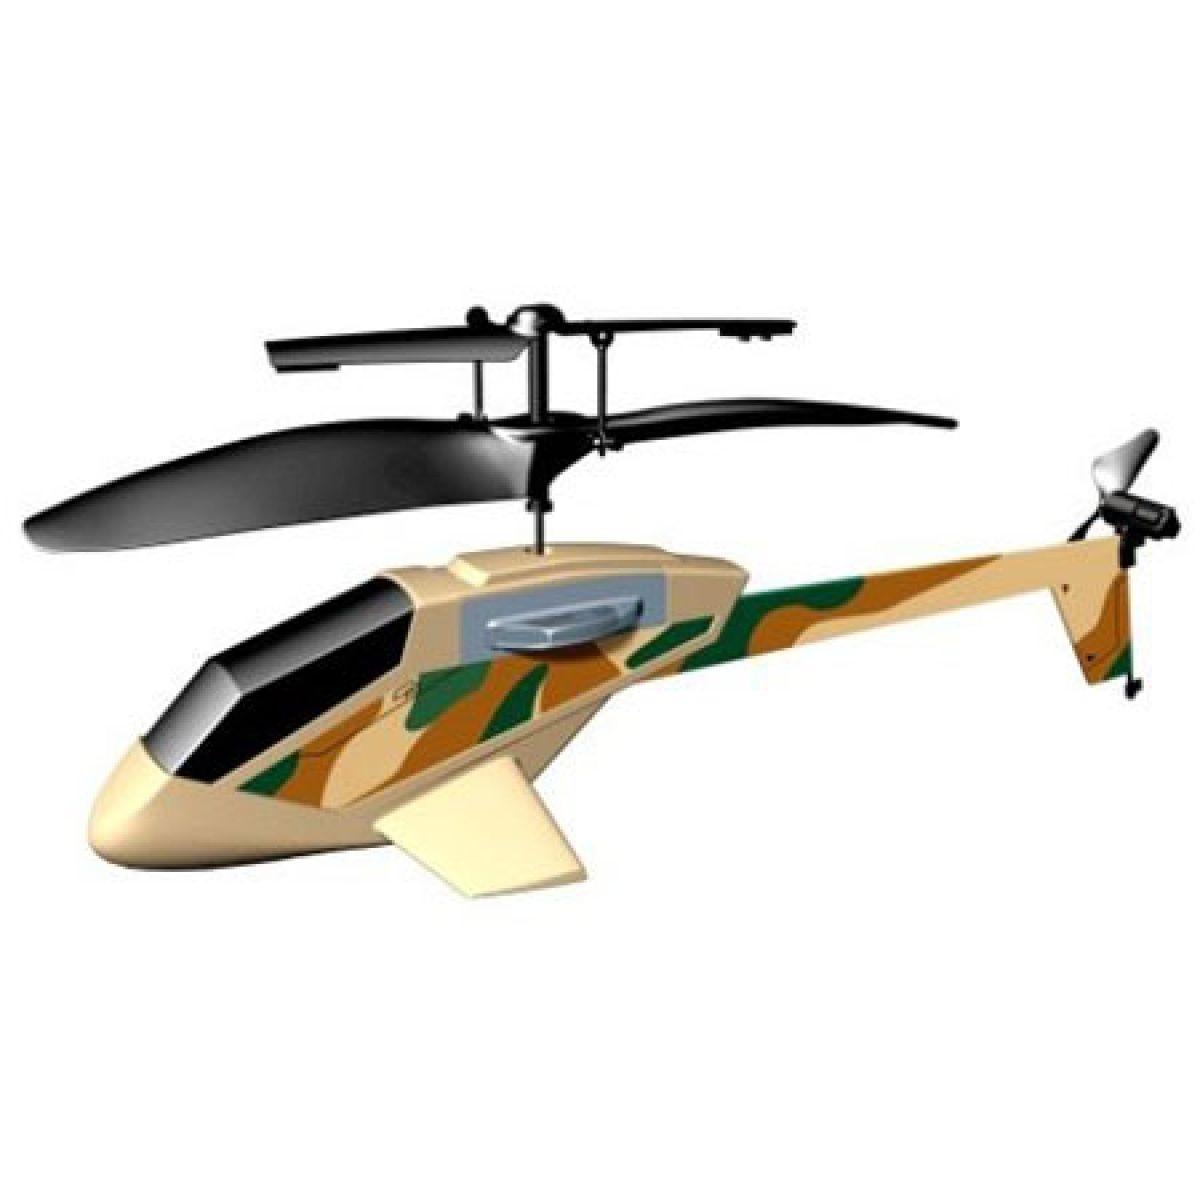 Silverlit GS1021_85720 - Helikoptéra X-Rotor:PicooZ Desert King